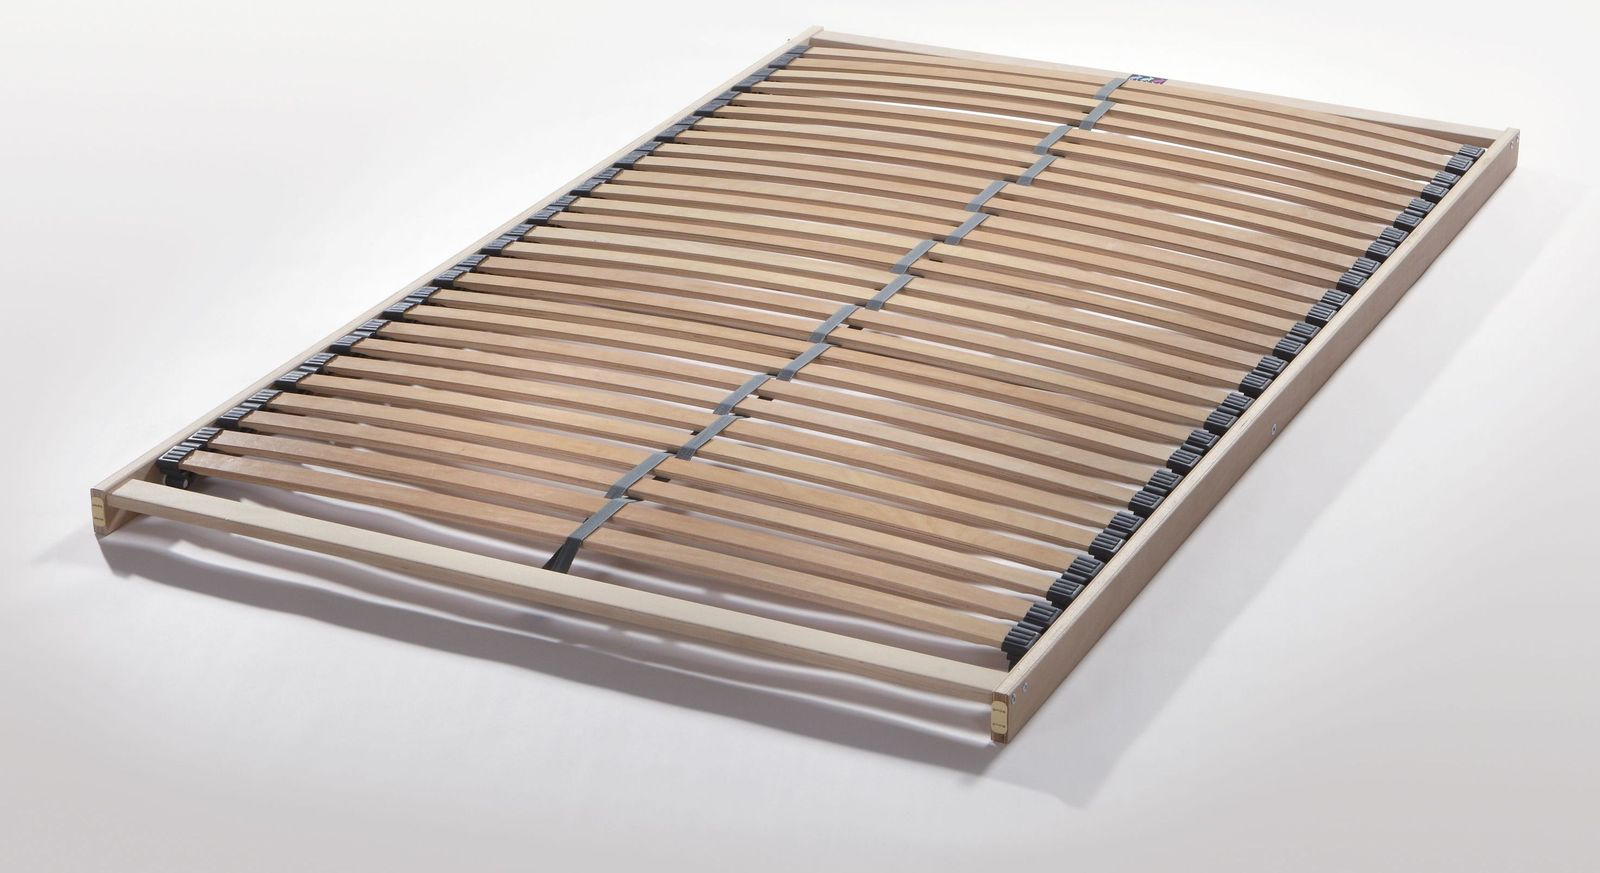 Premium-Lattenrost Kim 120 cm breit